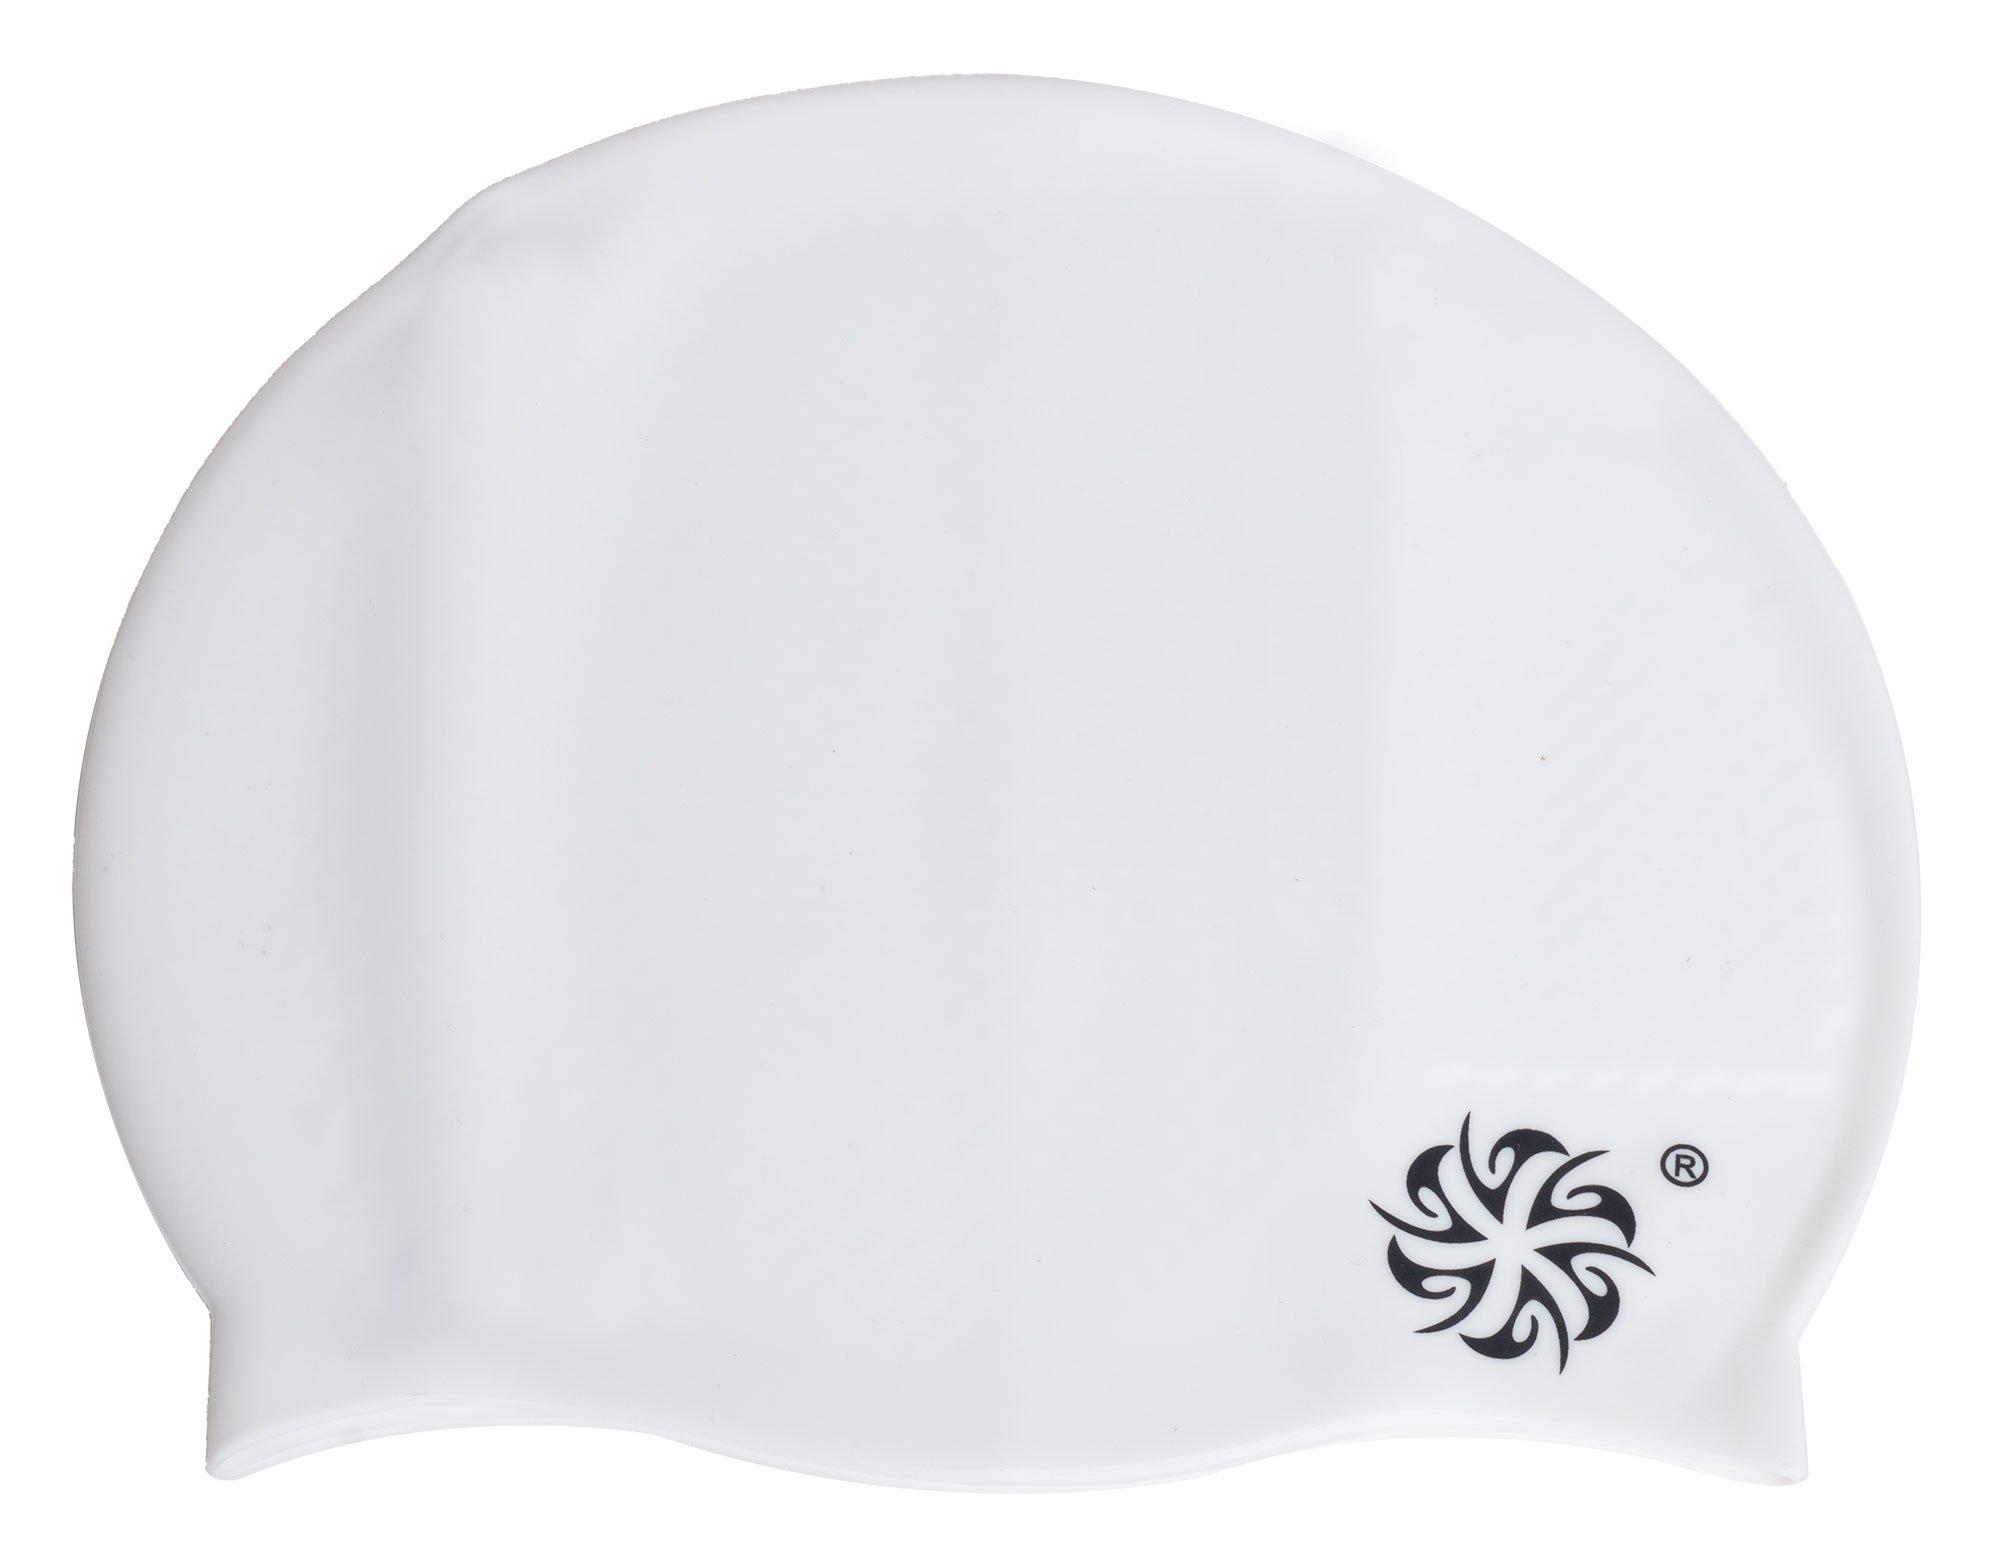 Mirou Badehætte i sporty look hvid, One Size